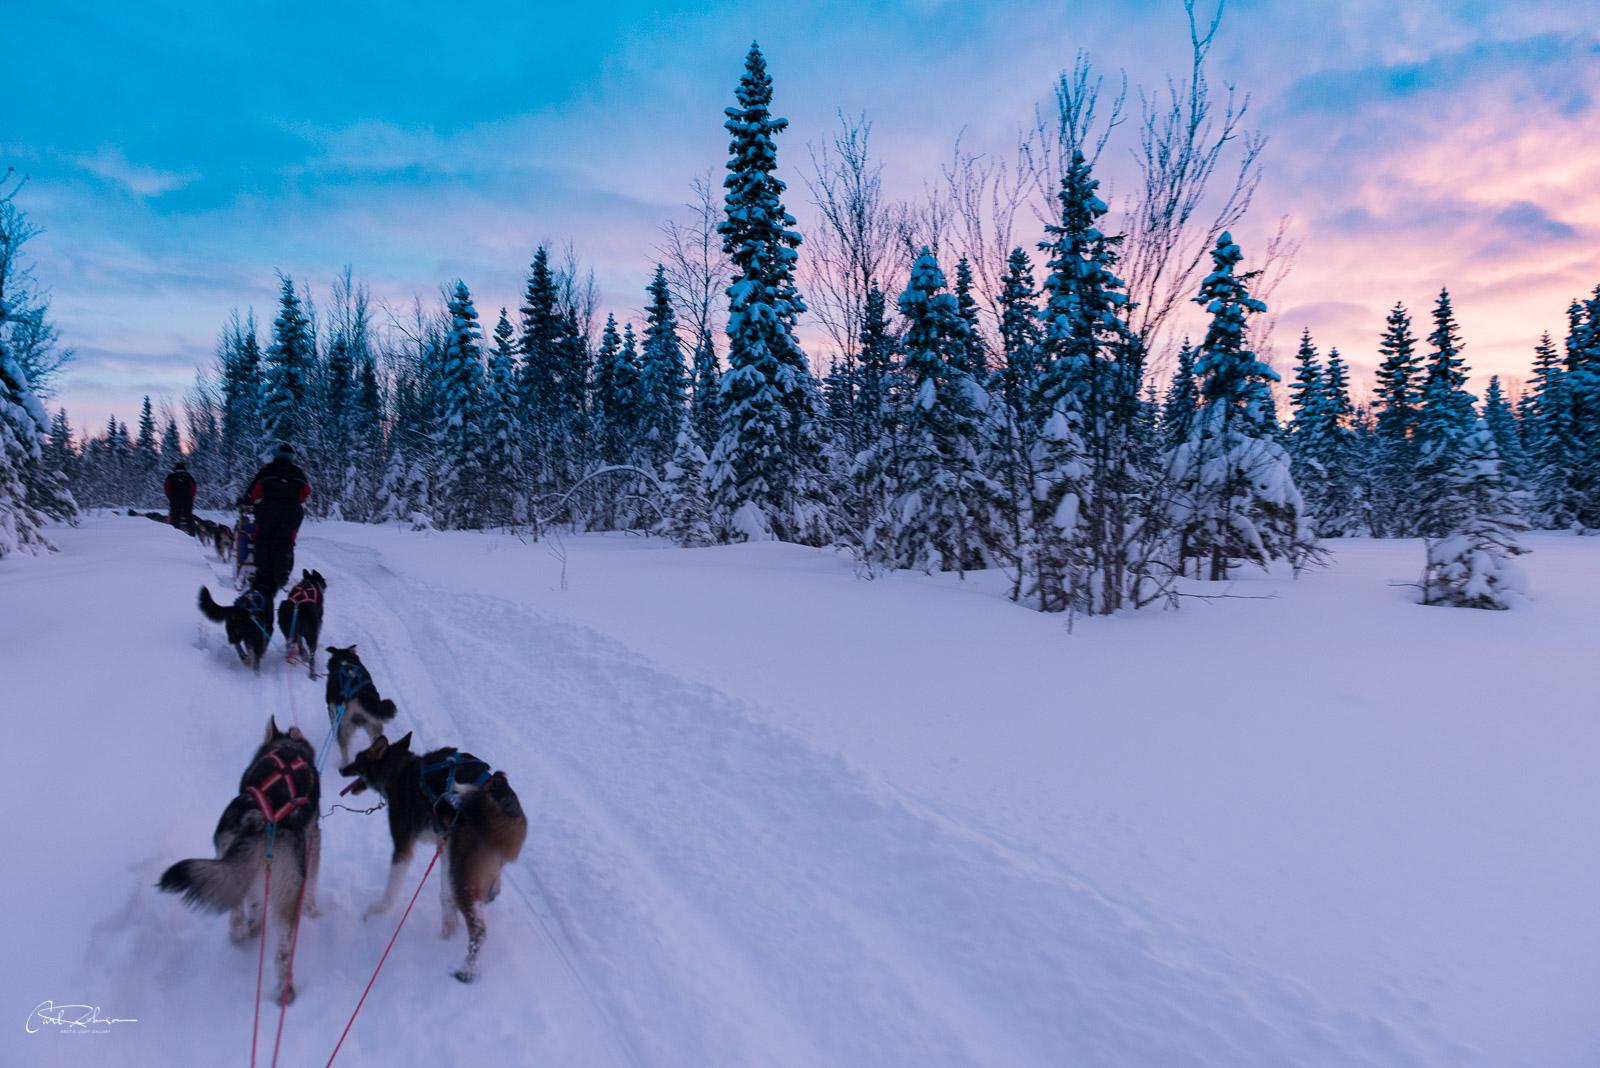 Sweden, landscape, winter, photo